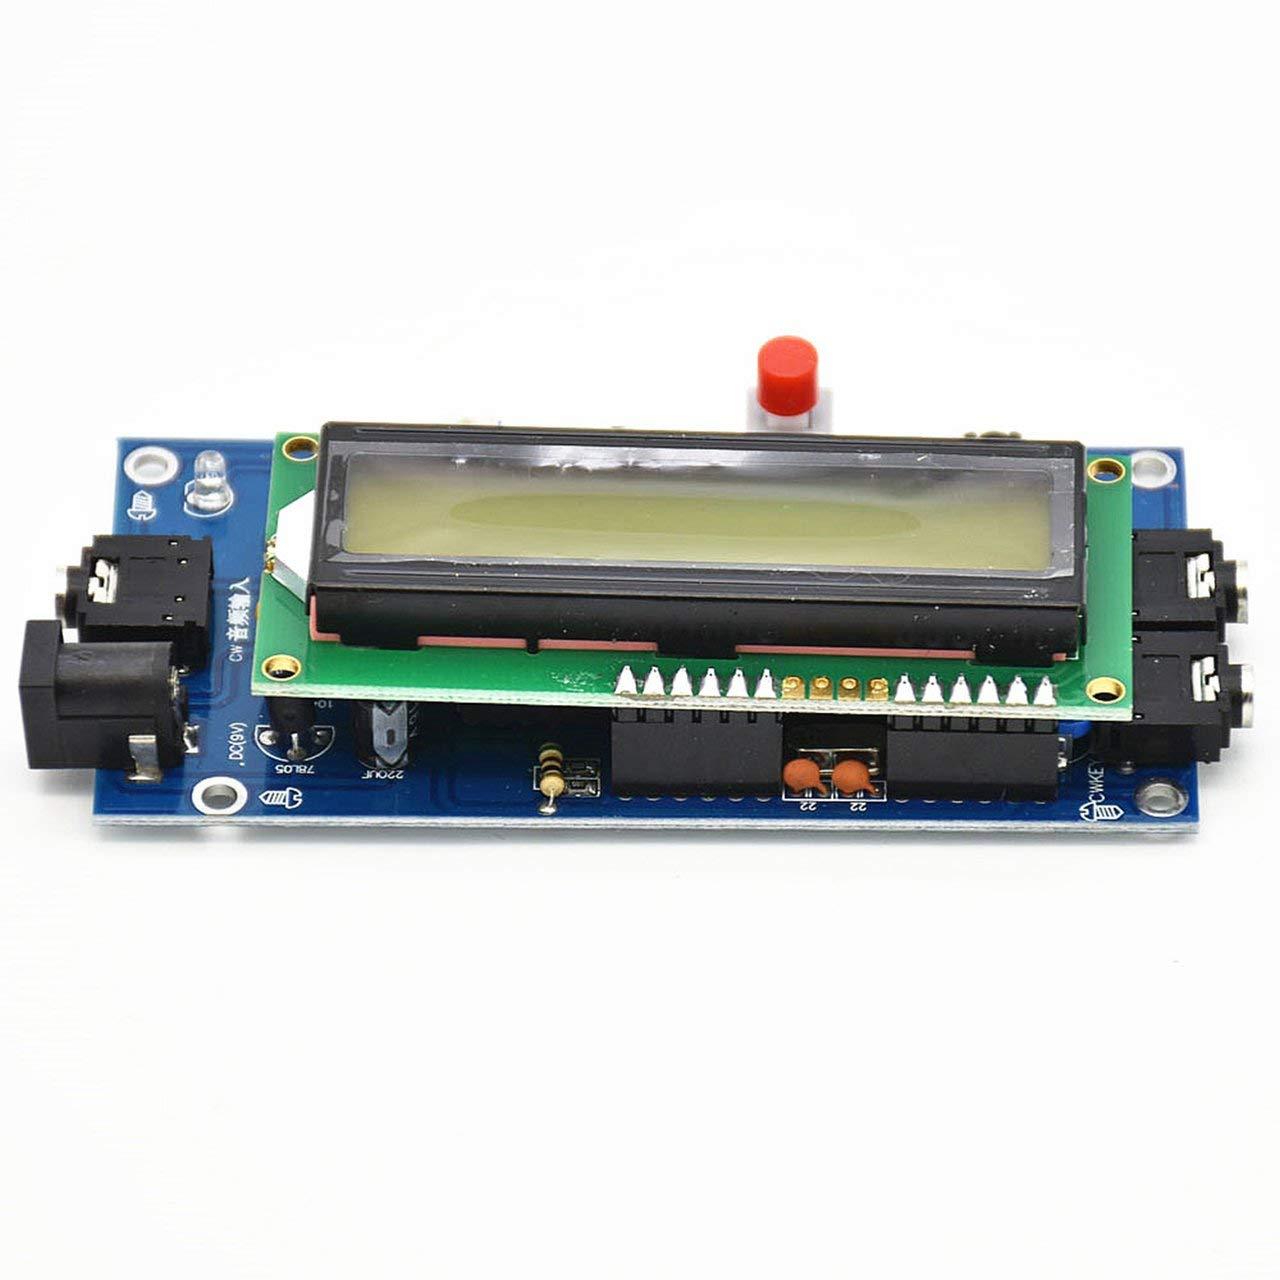 Lector de c/ódigo Morse Decodificador CW Traductor de c/ódigo Morse Ham Radio Accesorio Esencial Producto Duradero ESjasnyfall Verde